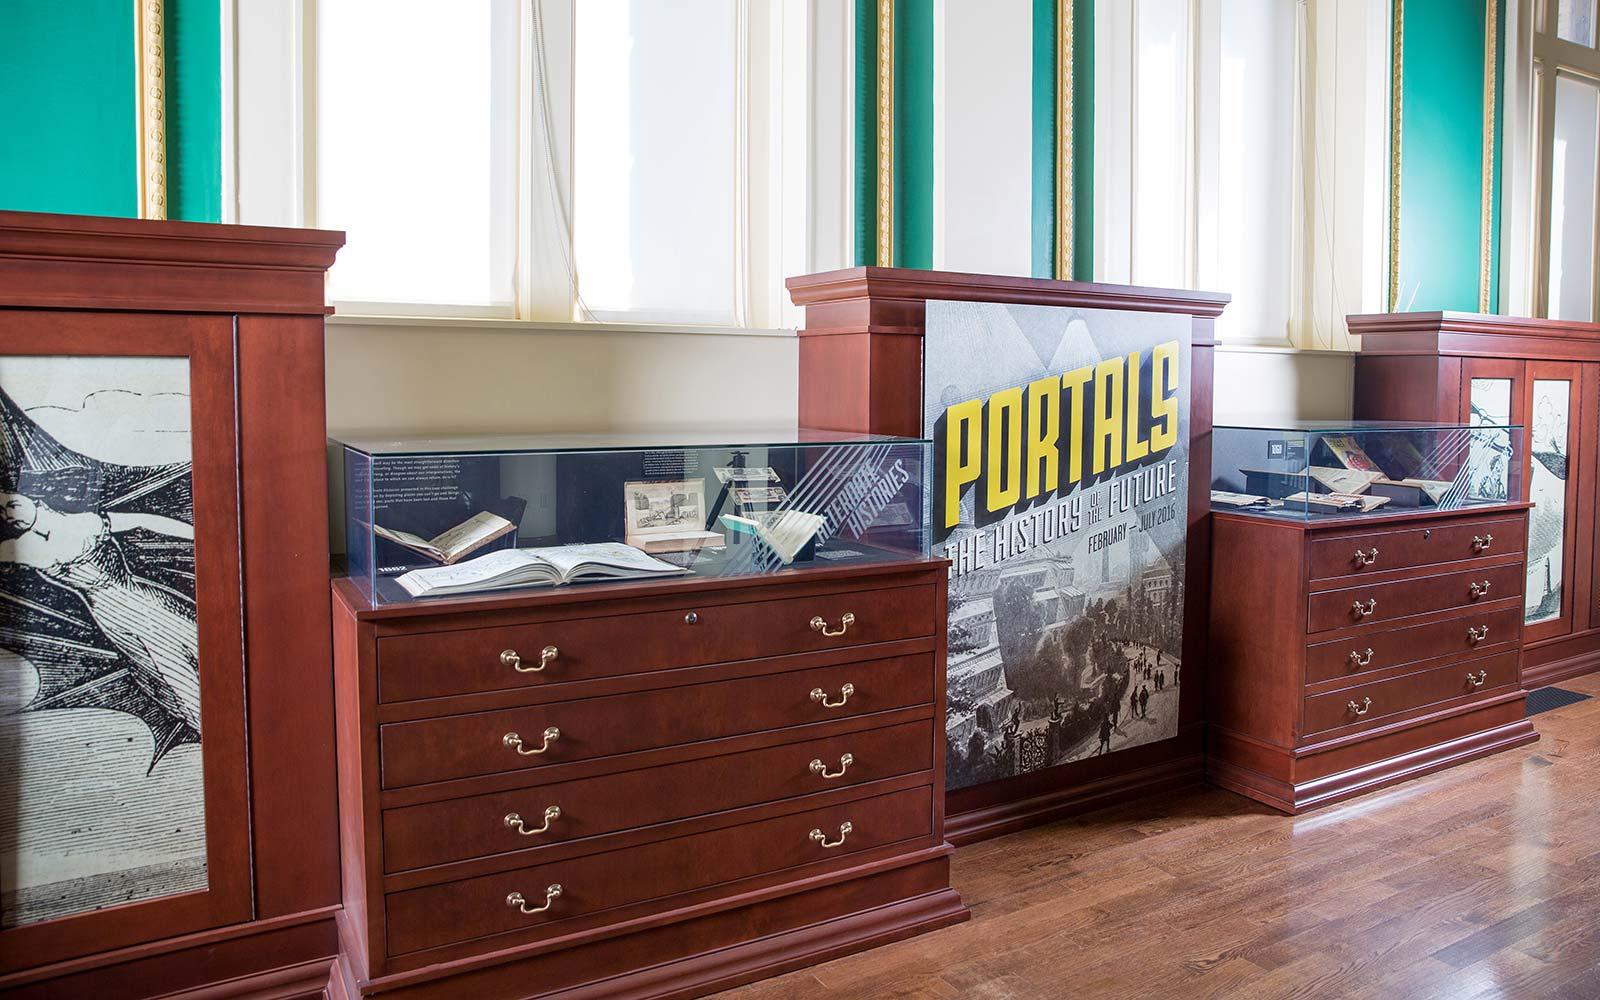 Exhibit signage designed for Providence Public Library